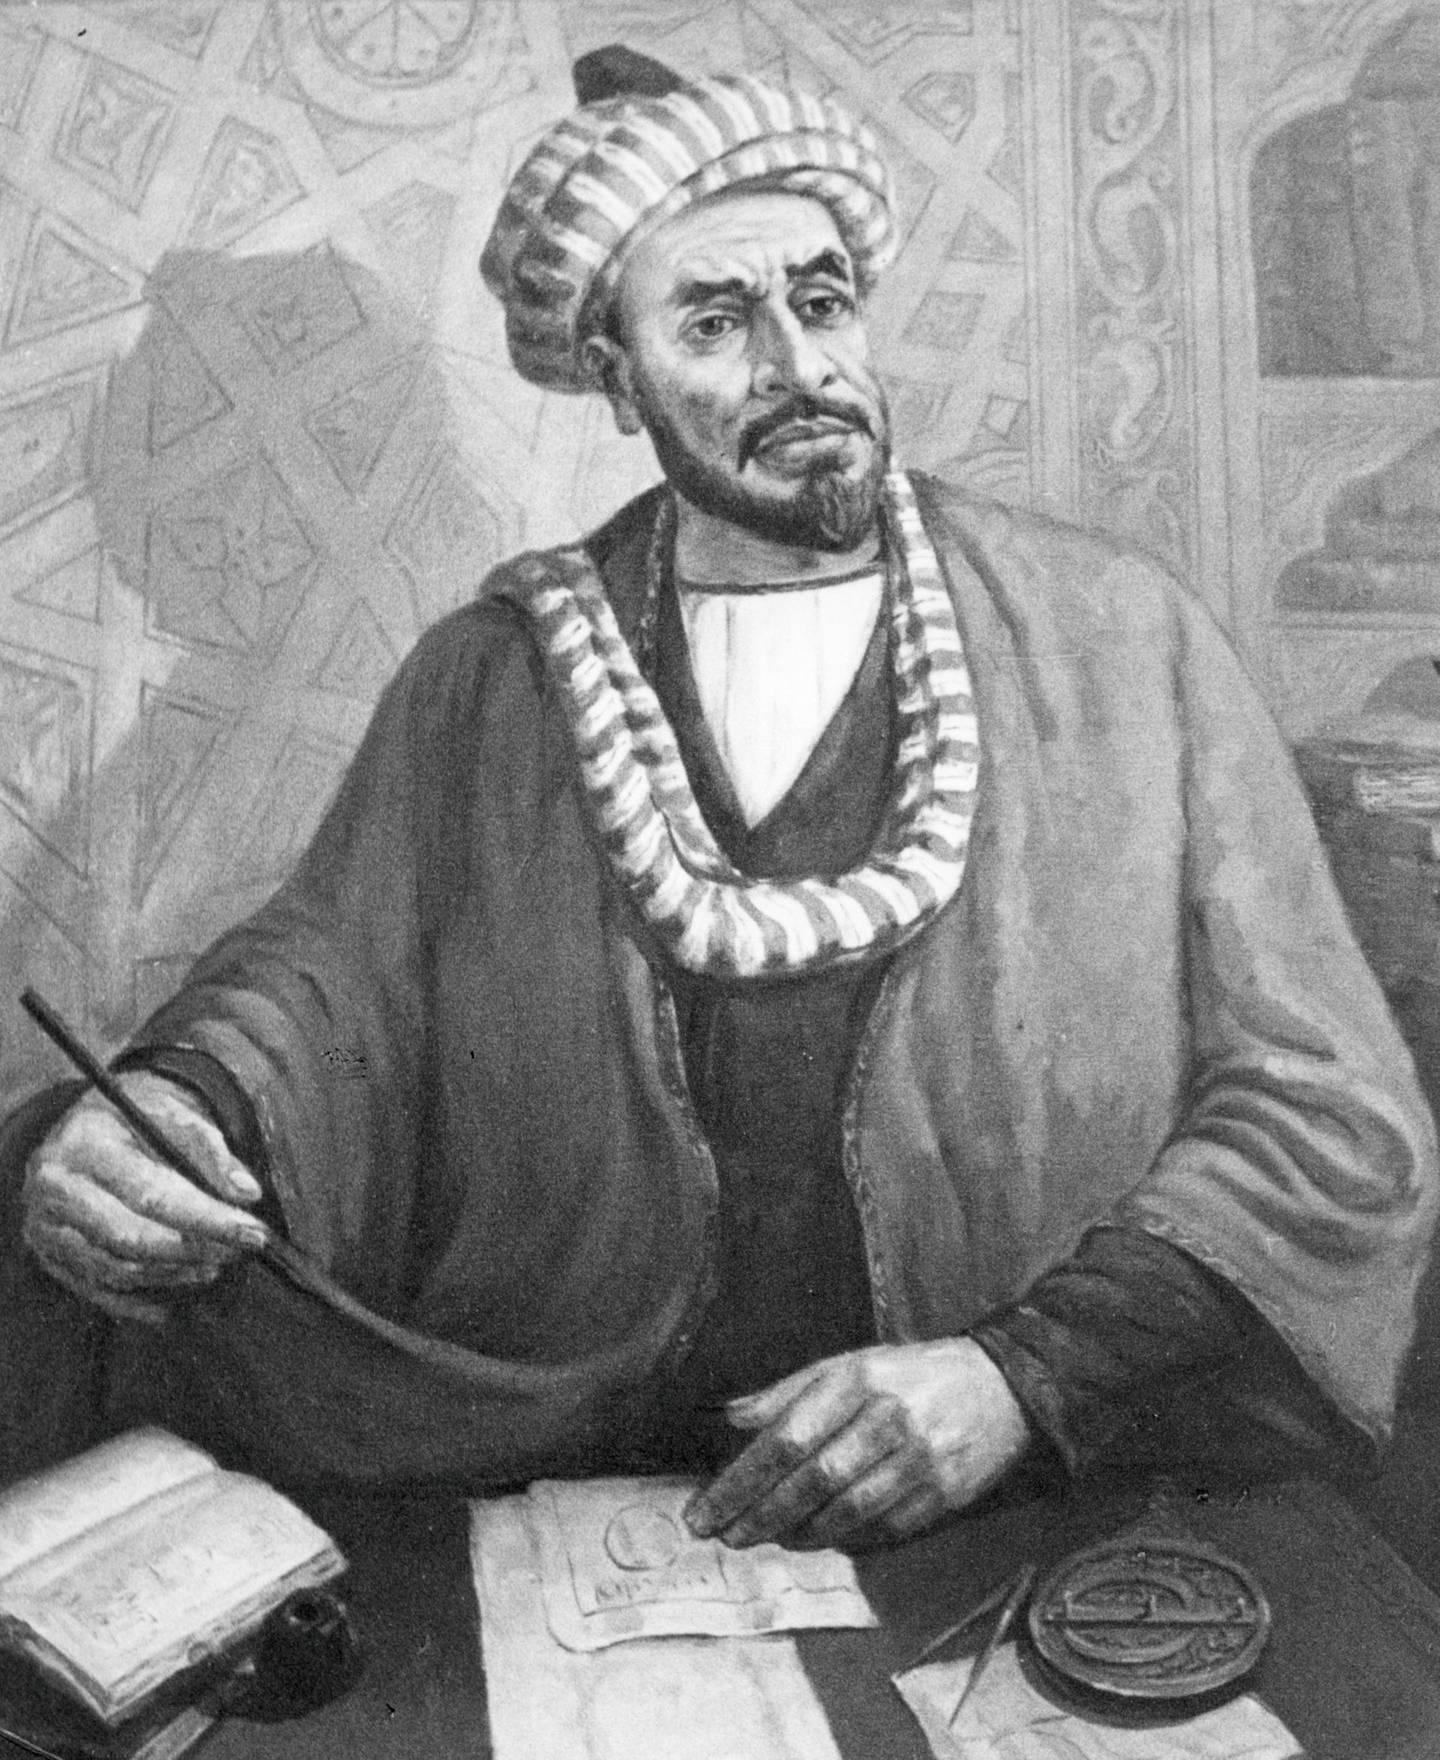 Portrait of mohaded al-khorezmi (al khwarizmi), uzbek mathematician, geographer and astronomer, 780-850 ad, painting by 20th century uzbek artist m, nabiyev, 1982. (Photo by: Sovfoto/UIG via Getty Images)